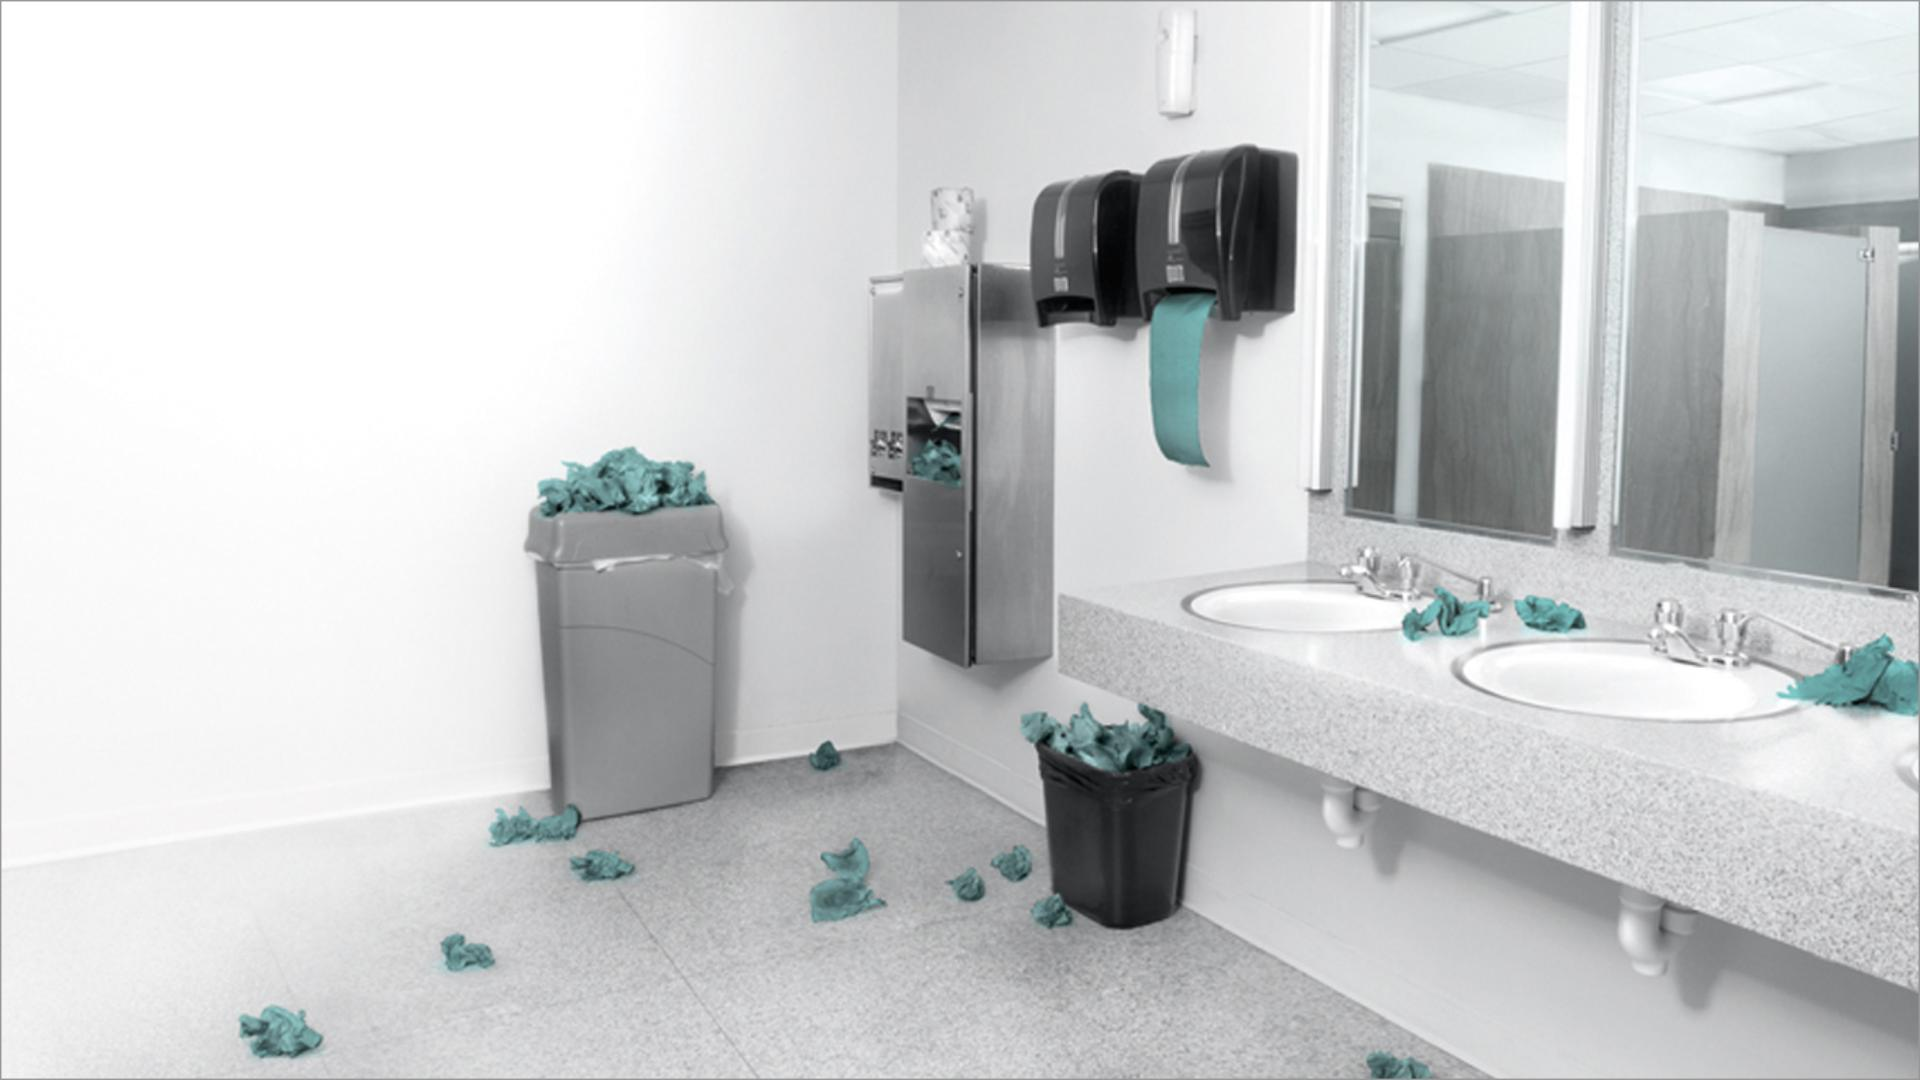 Kirli bir tuvalet